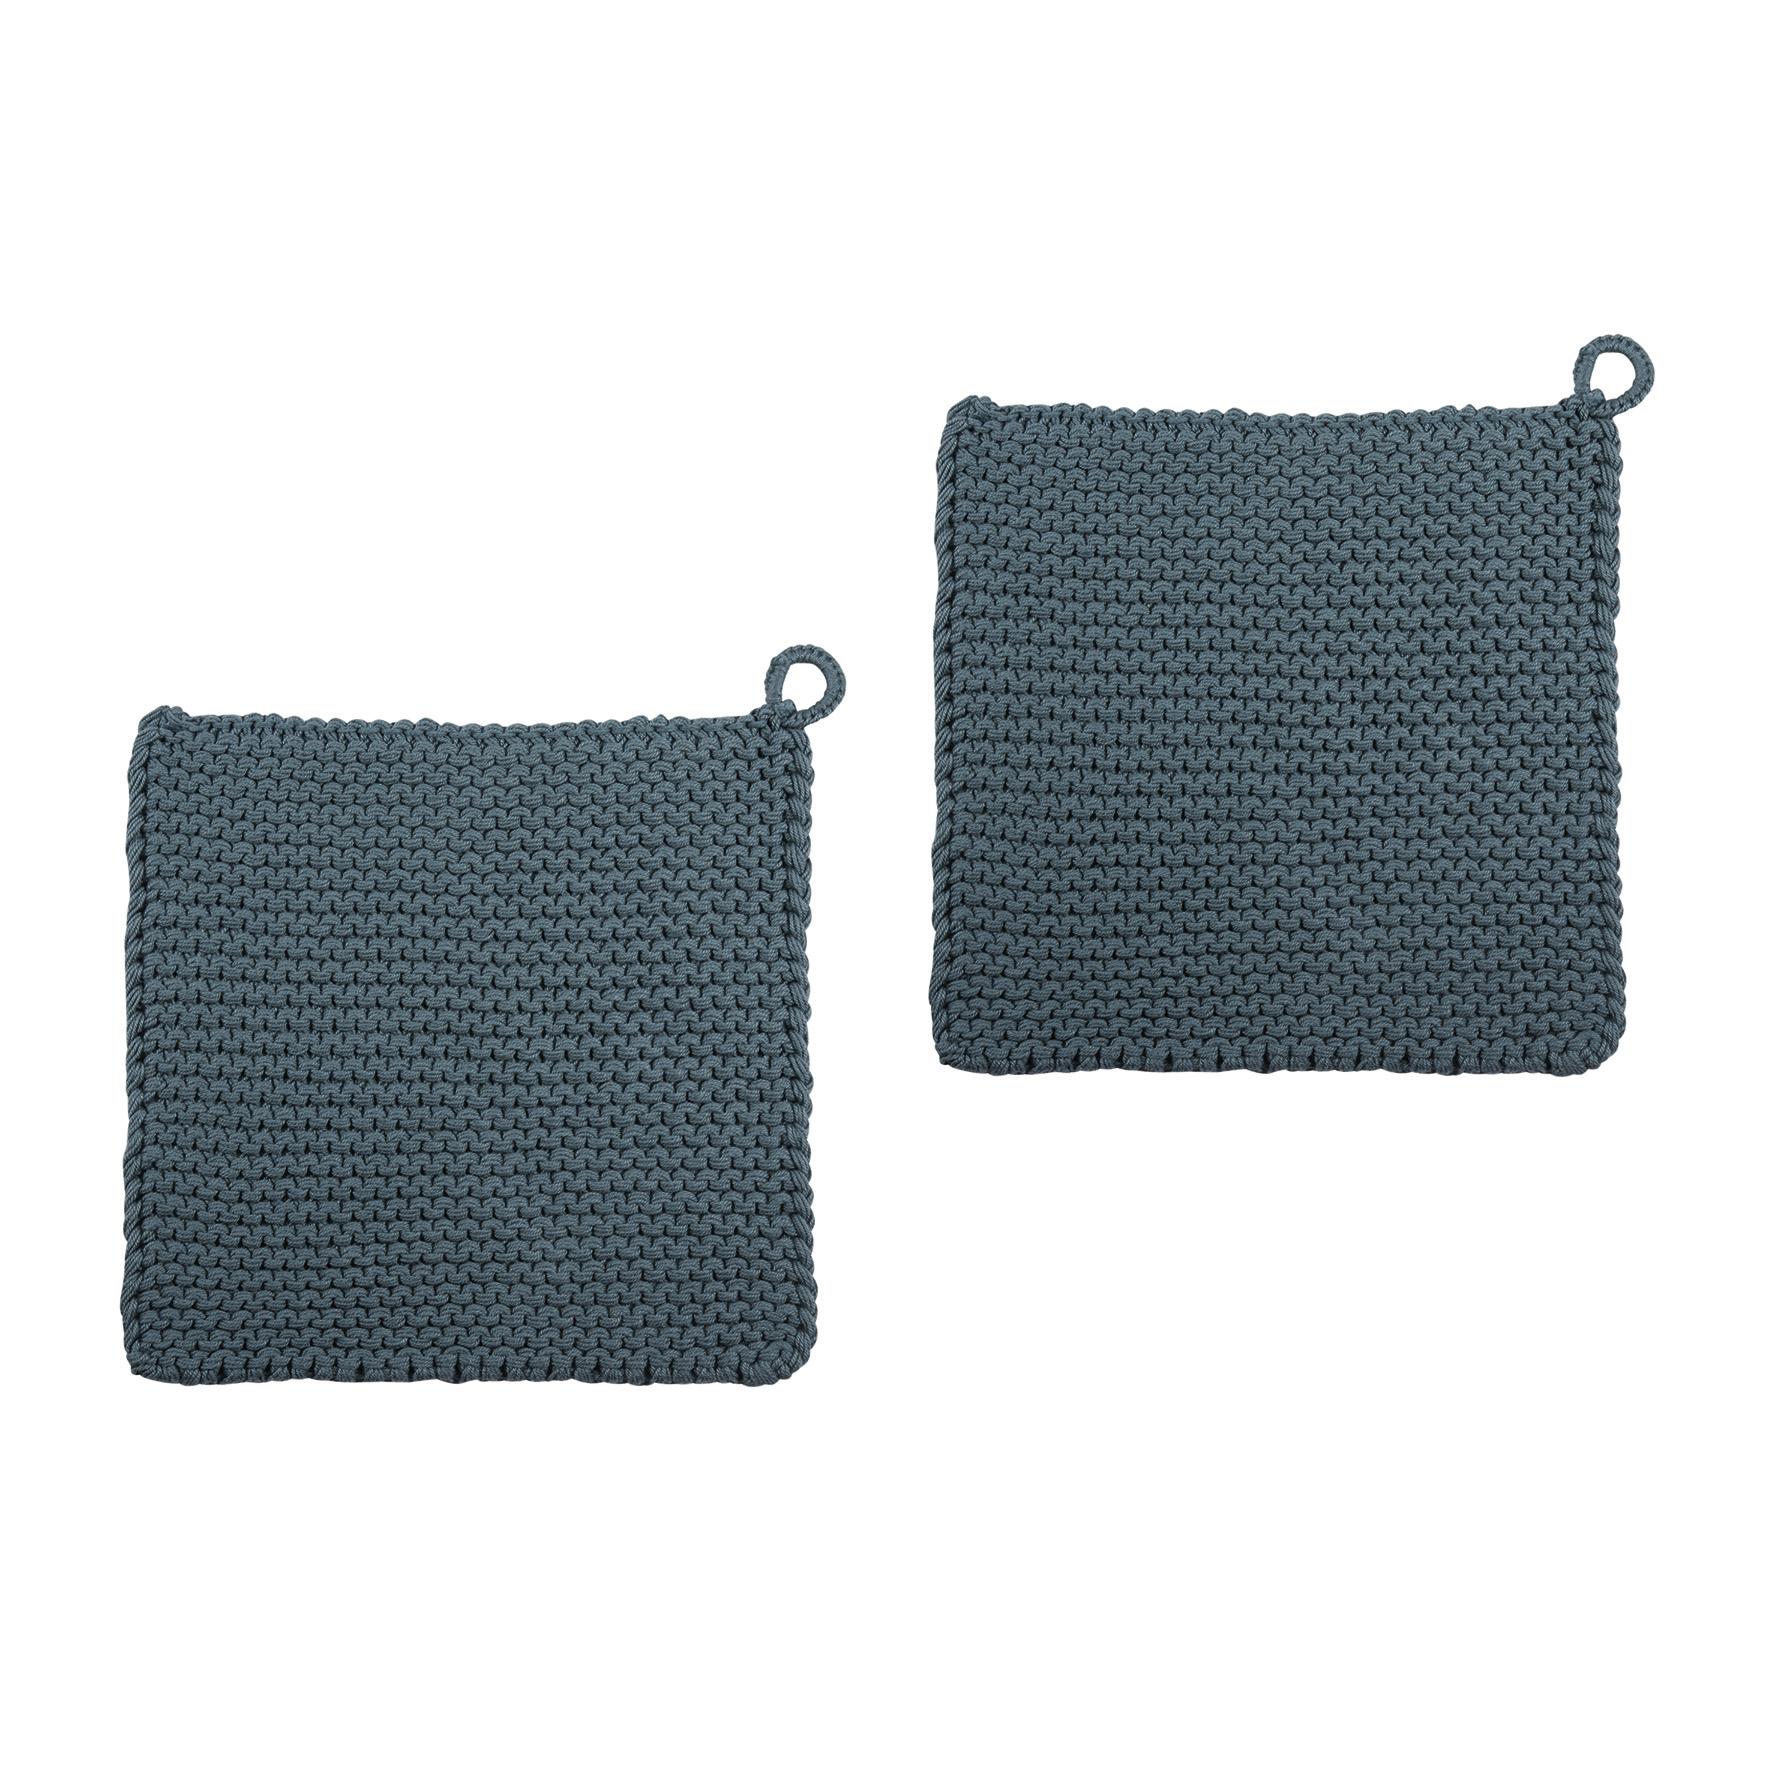 Topflappen - Twist Aqua 25x25 2er Pack - PAD home design